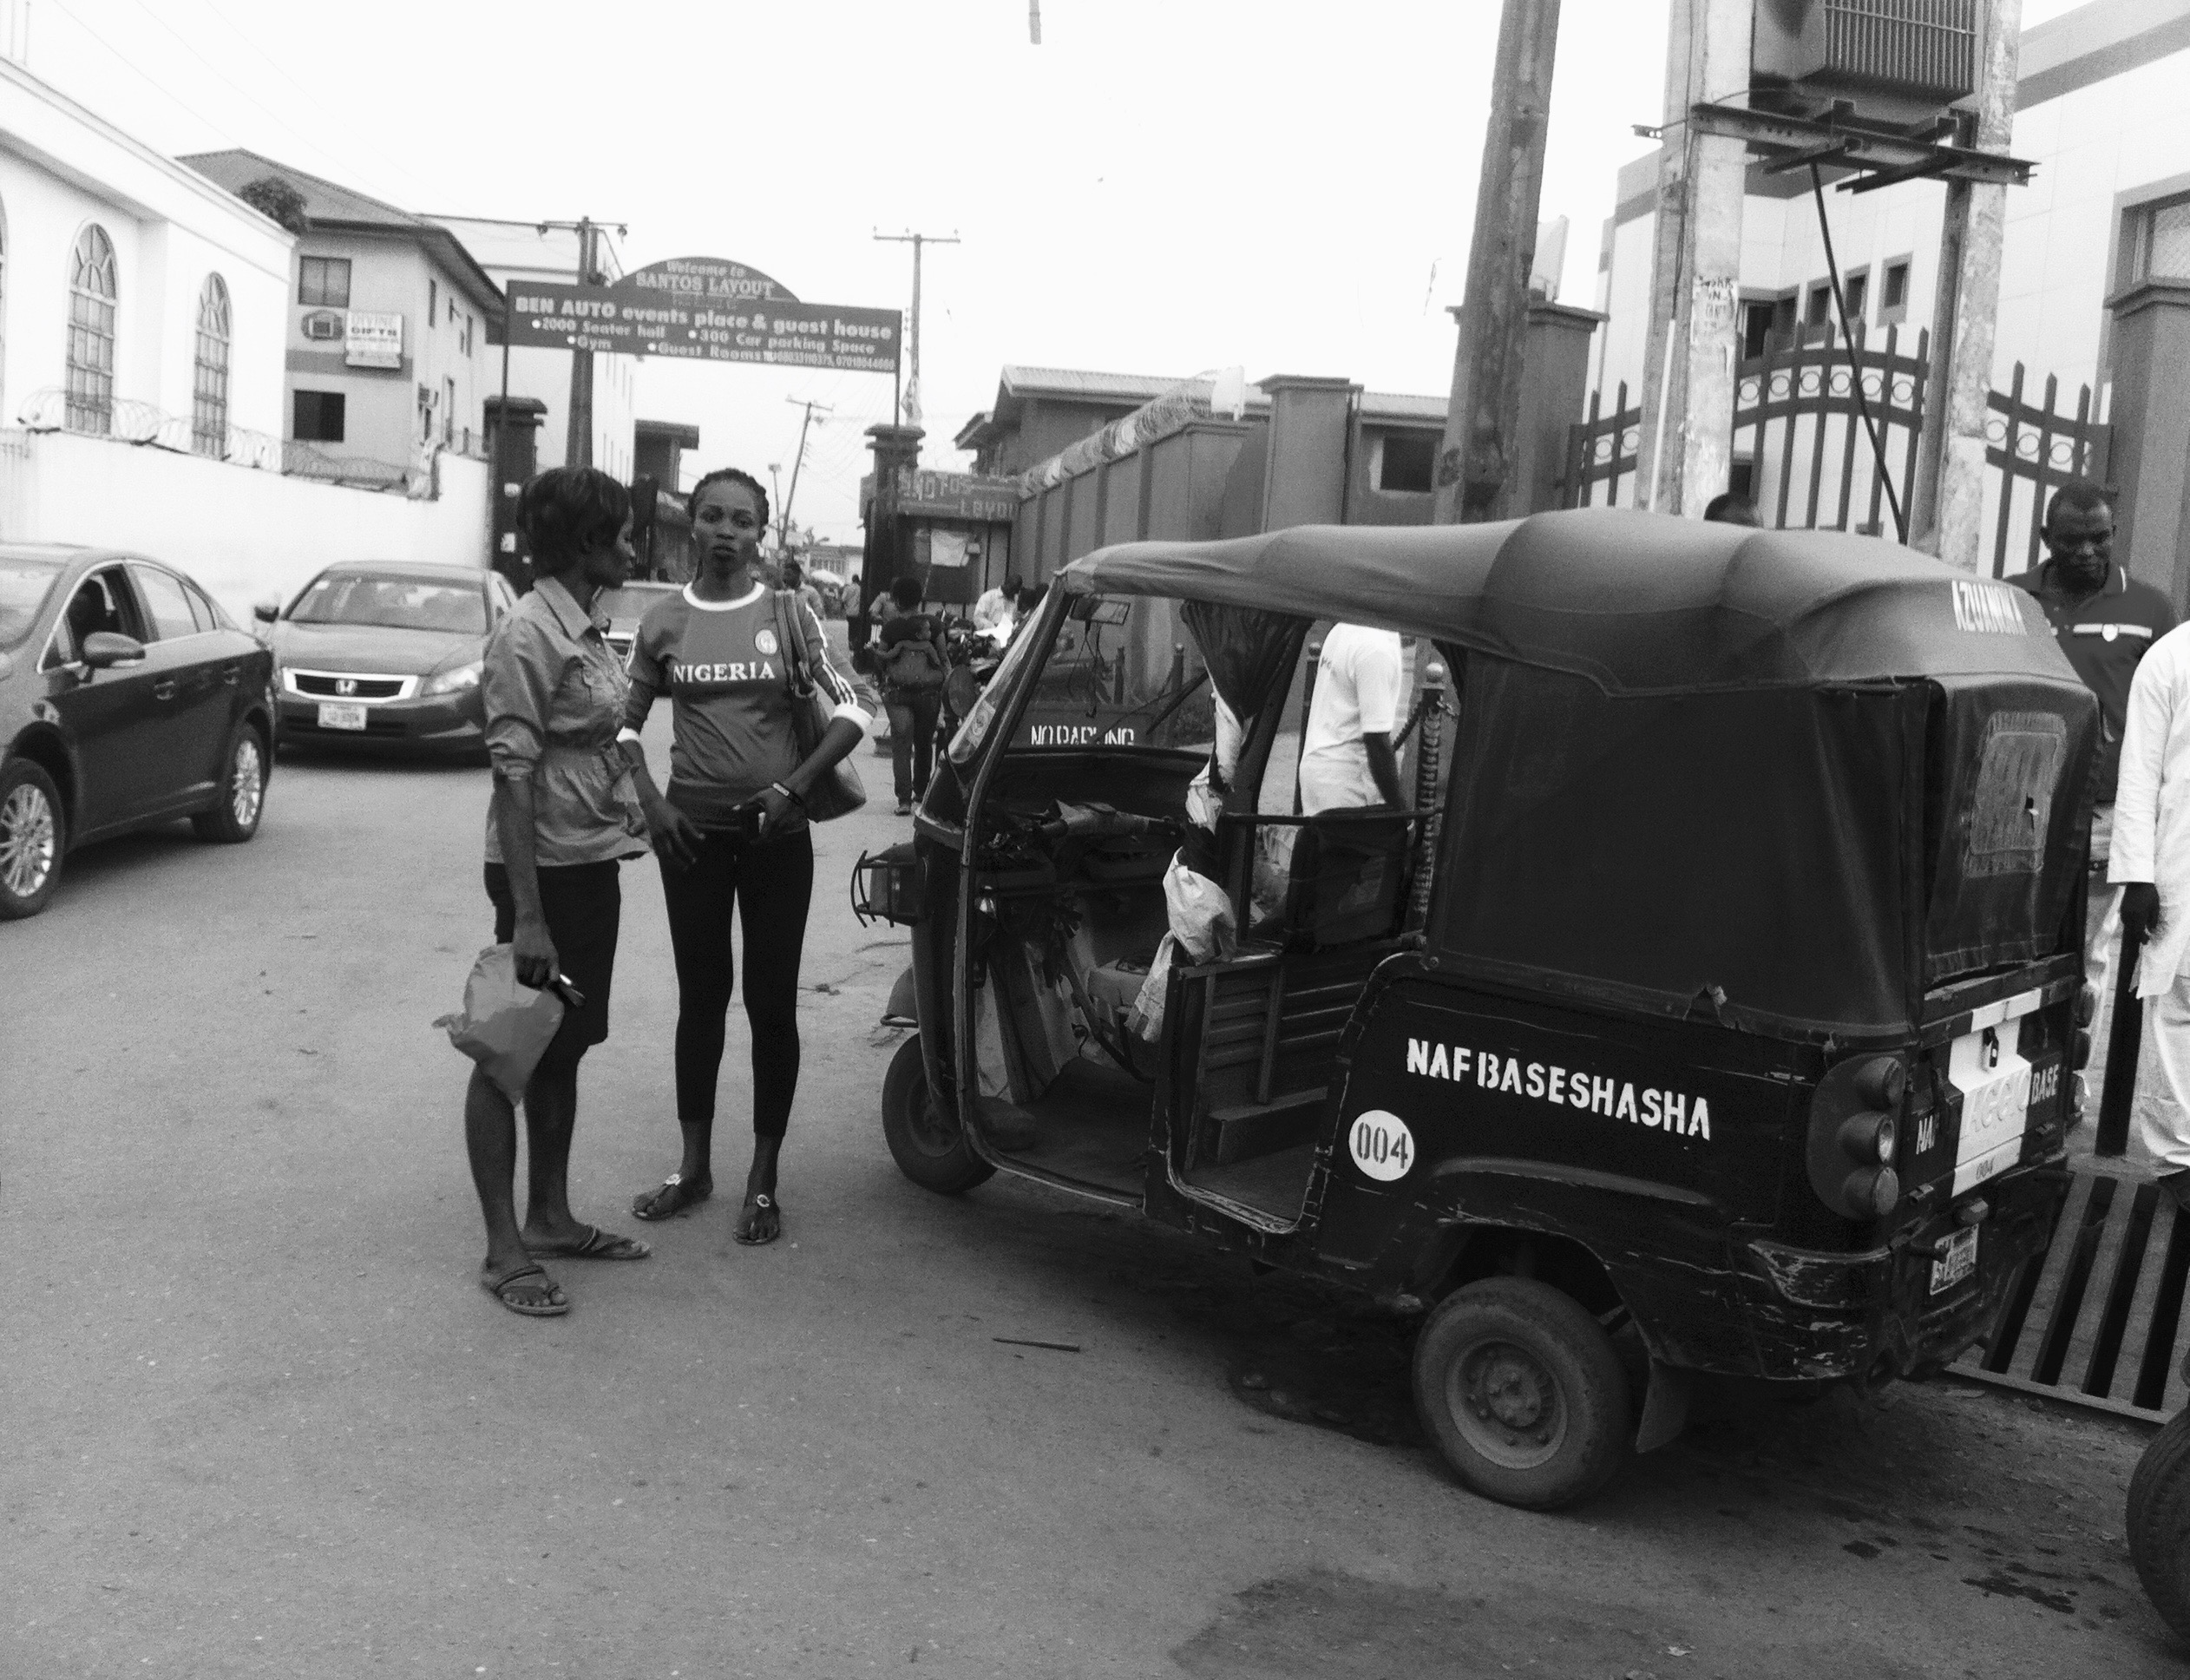 Ikeja, Lagos, Nigeria. #JujuFilms